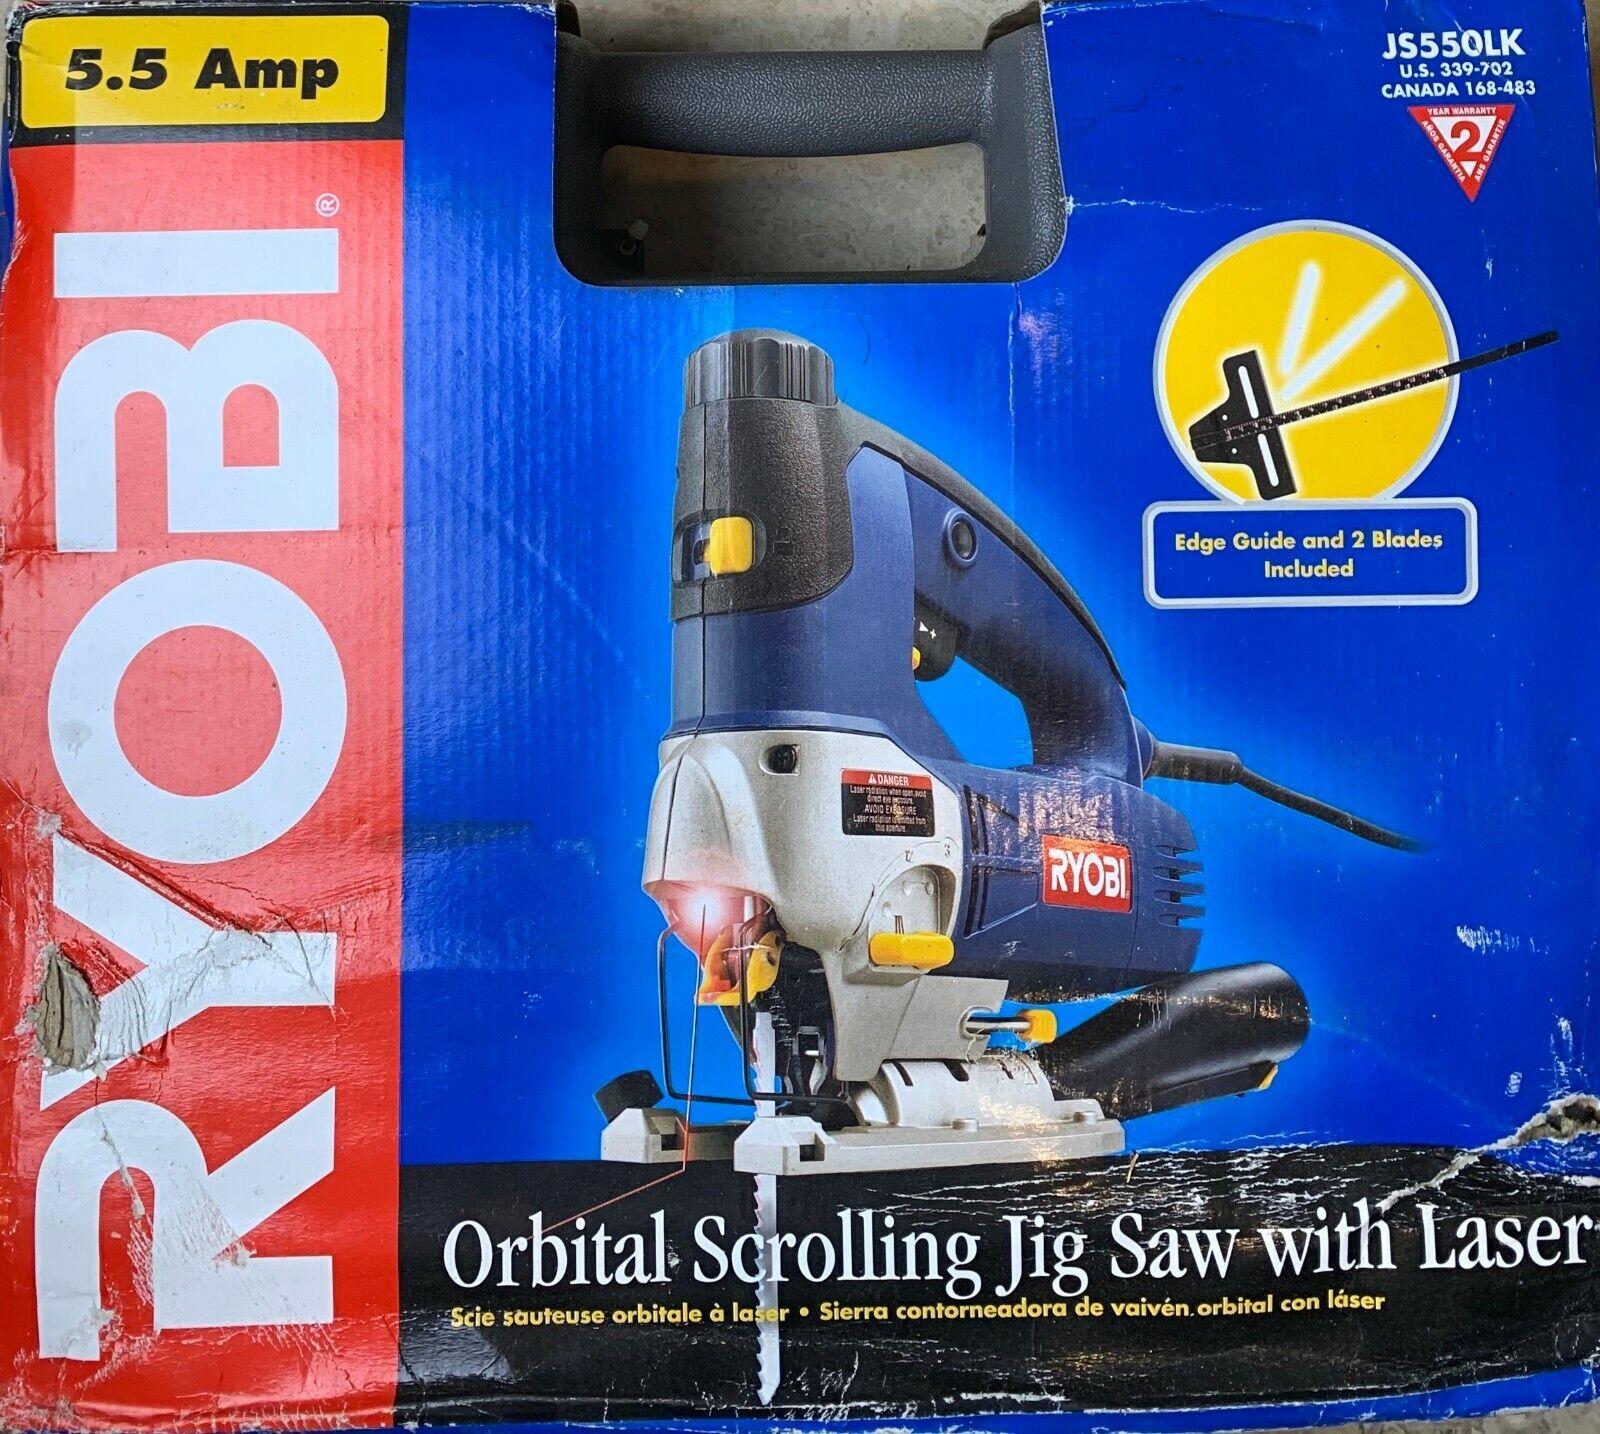 NEW RYOBI JS550LK Orbital-Scrolling Jig Saw with Laser Kit